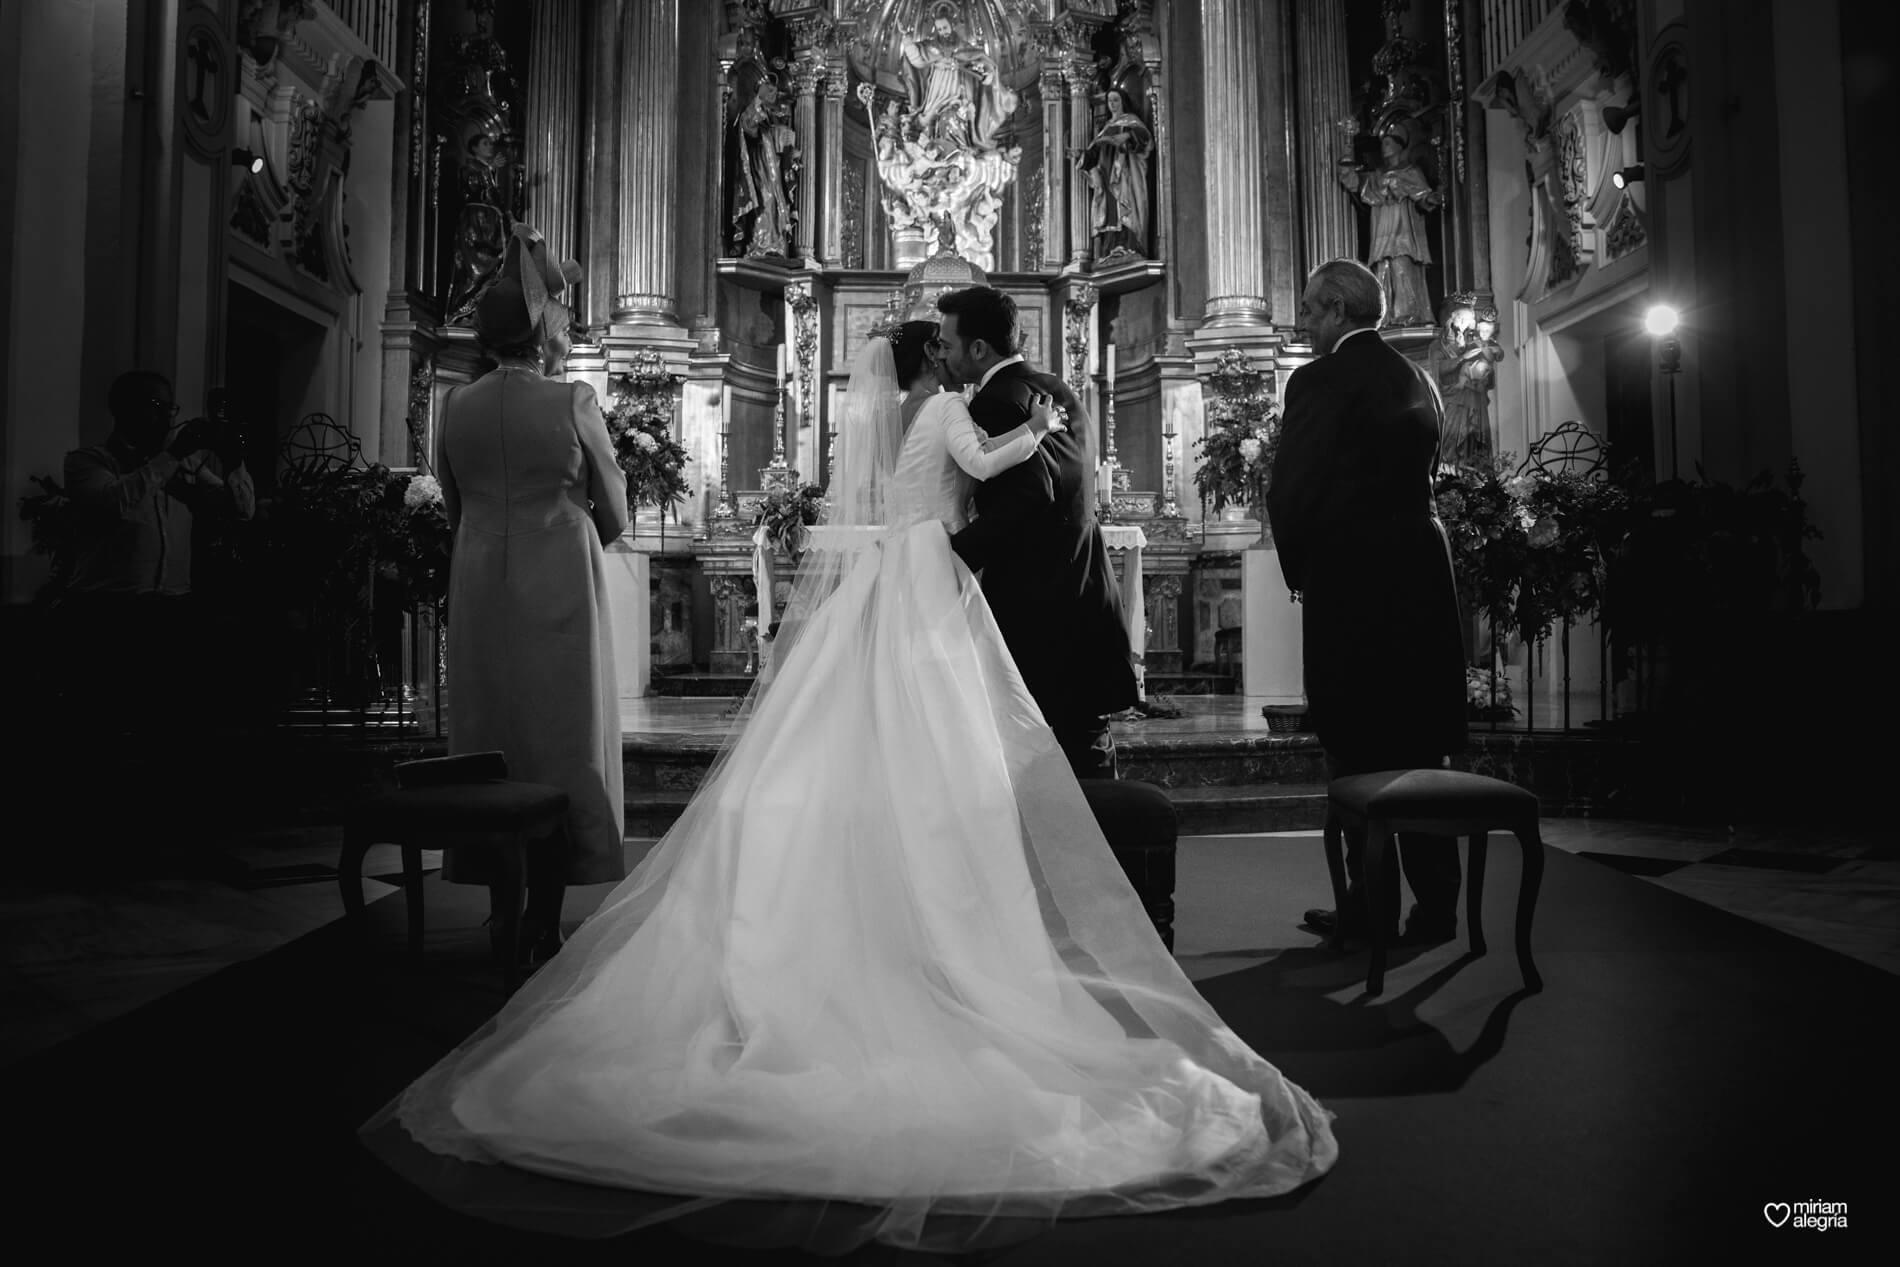 vestido-de-novia-paula-del-vas-miriam-alegria-fotografos-boda-murcia-64